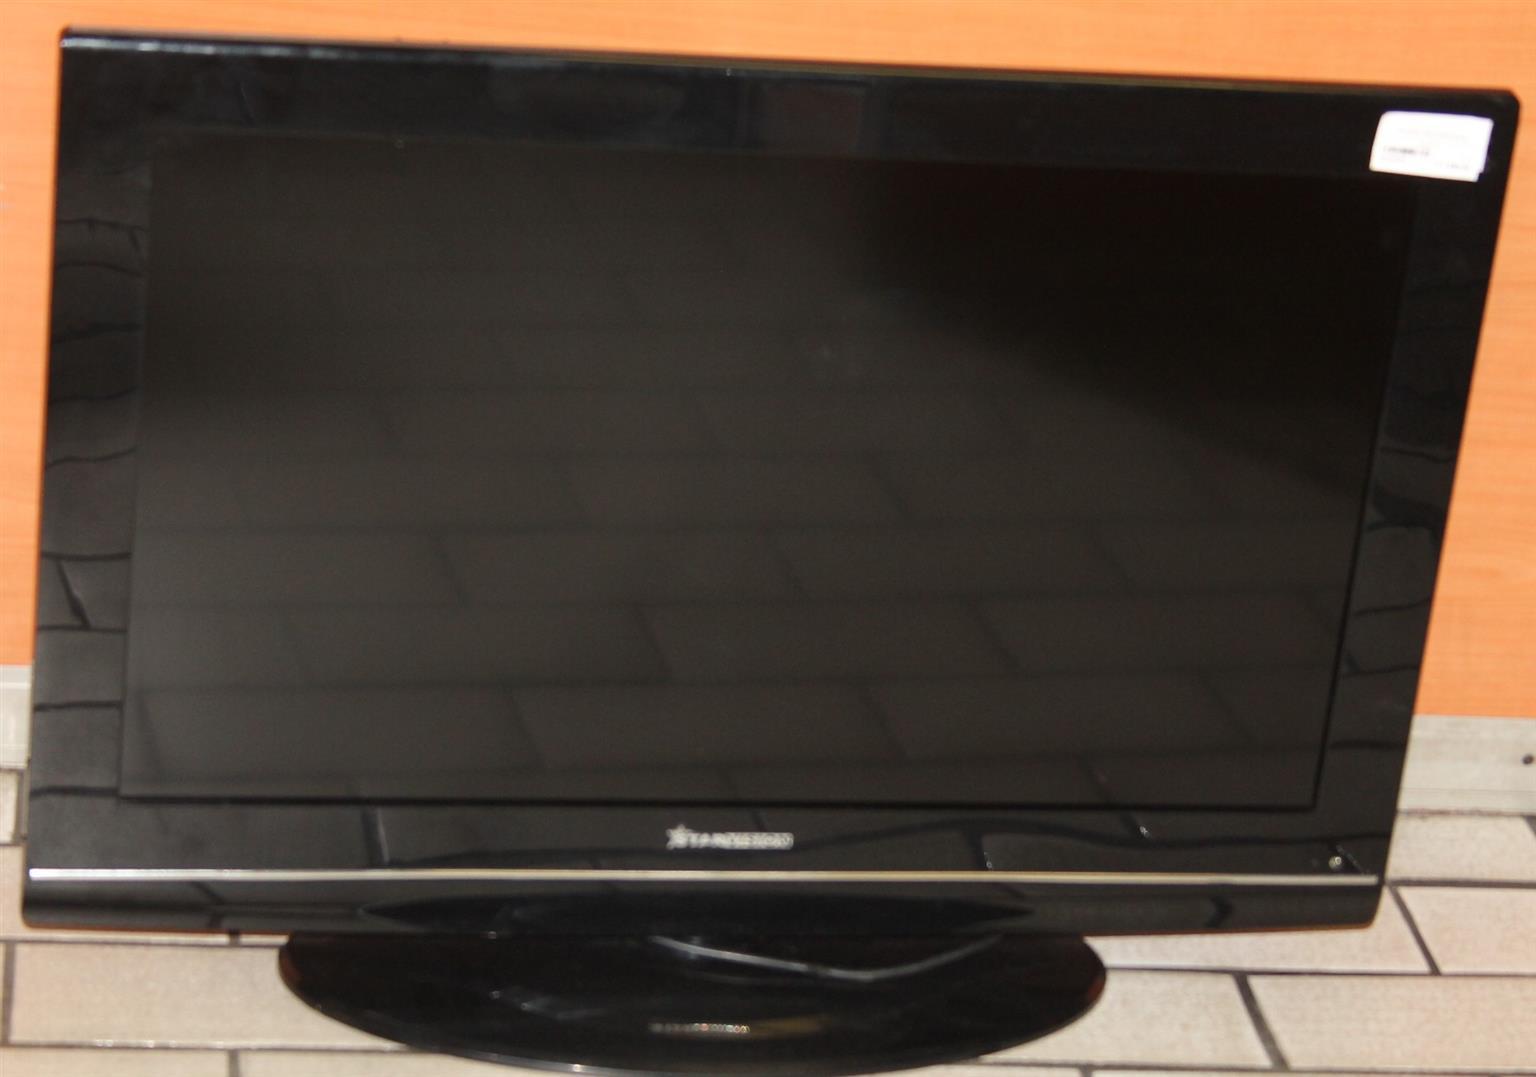 Star vision 32 inch tv S029090a #Rosettenvillepawnshop